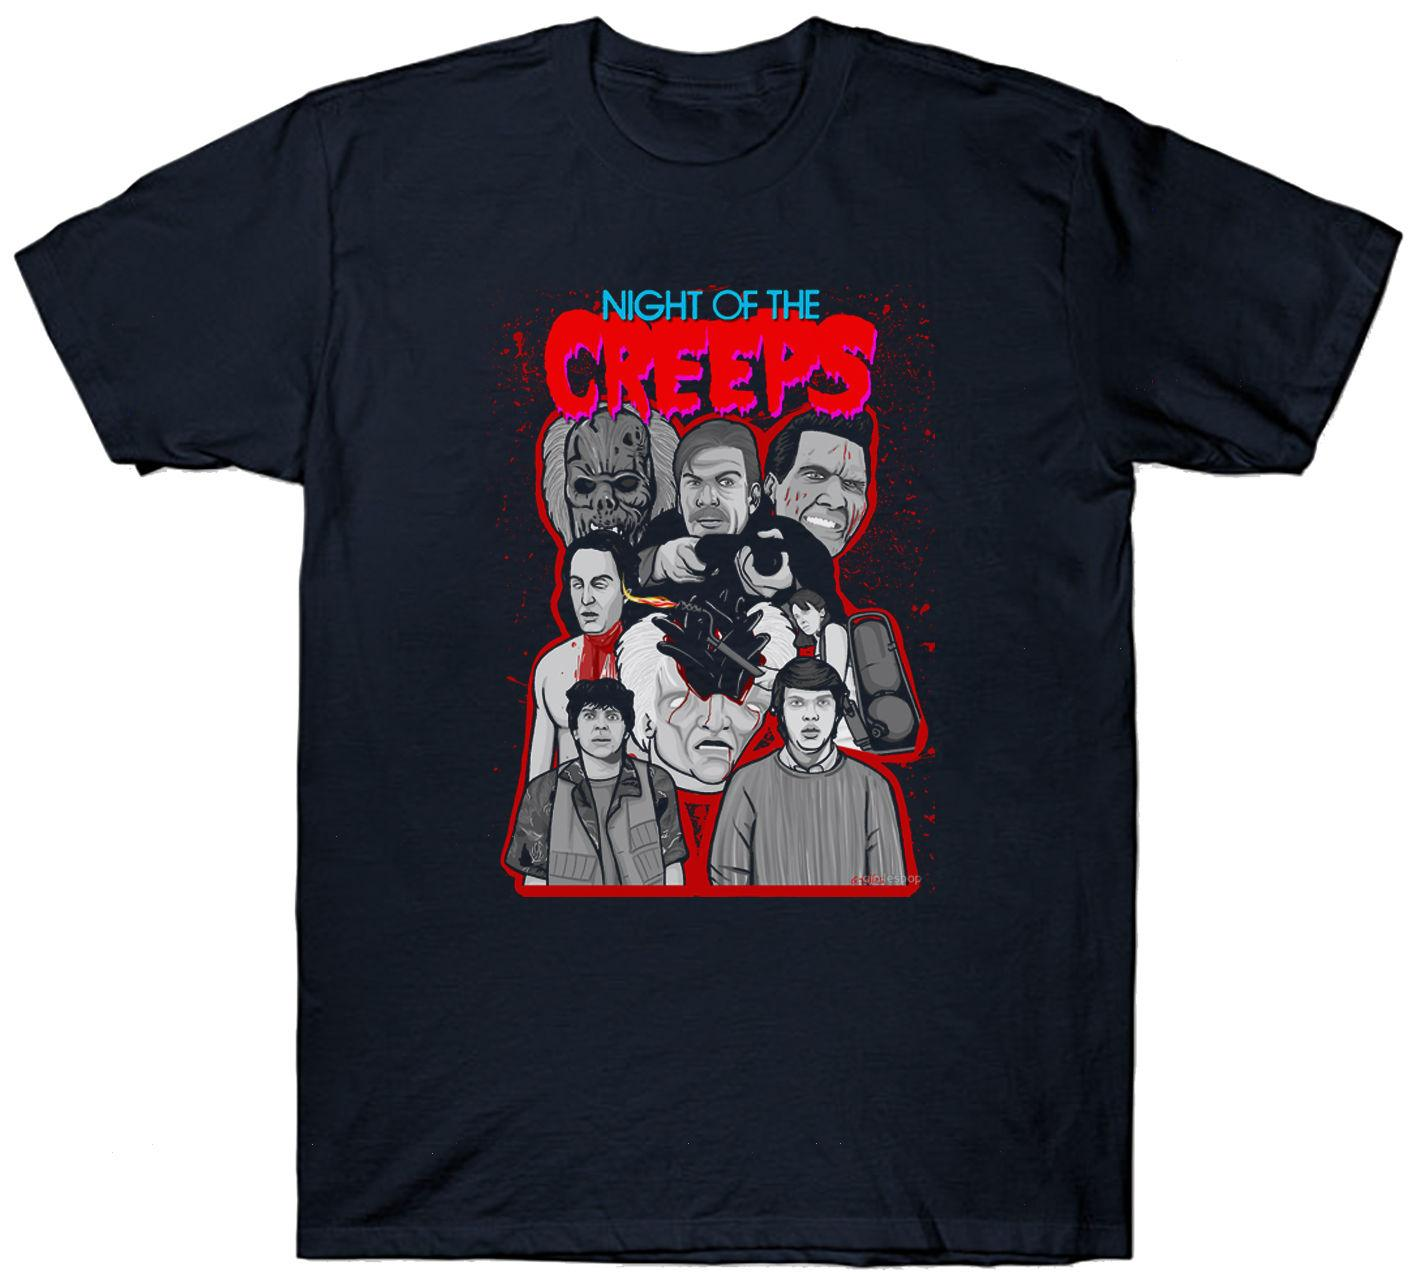 Nacht der Creeps T Shirt Top Kult Film Film 1980 S Fan Horror Sci Fi